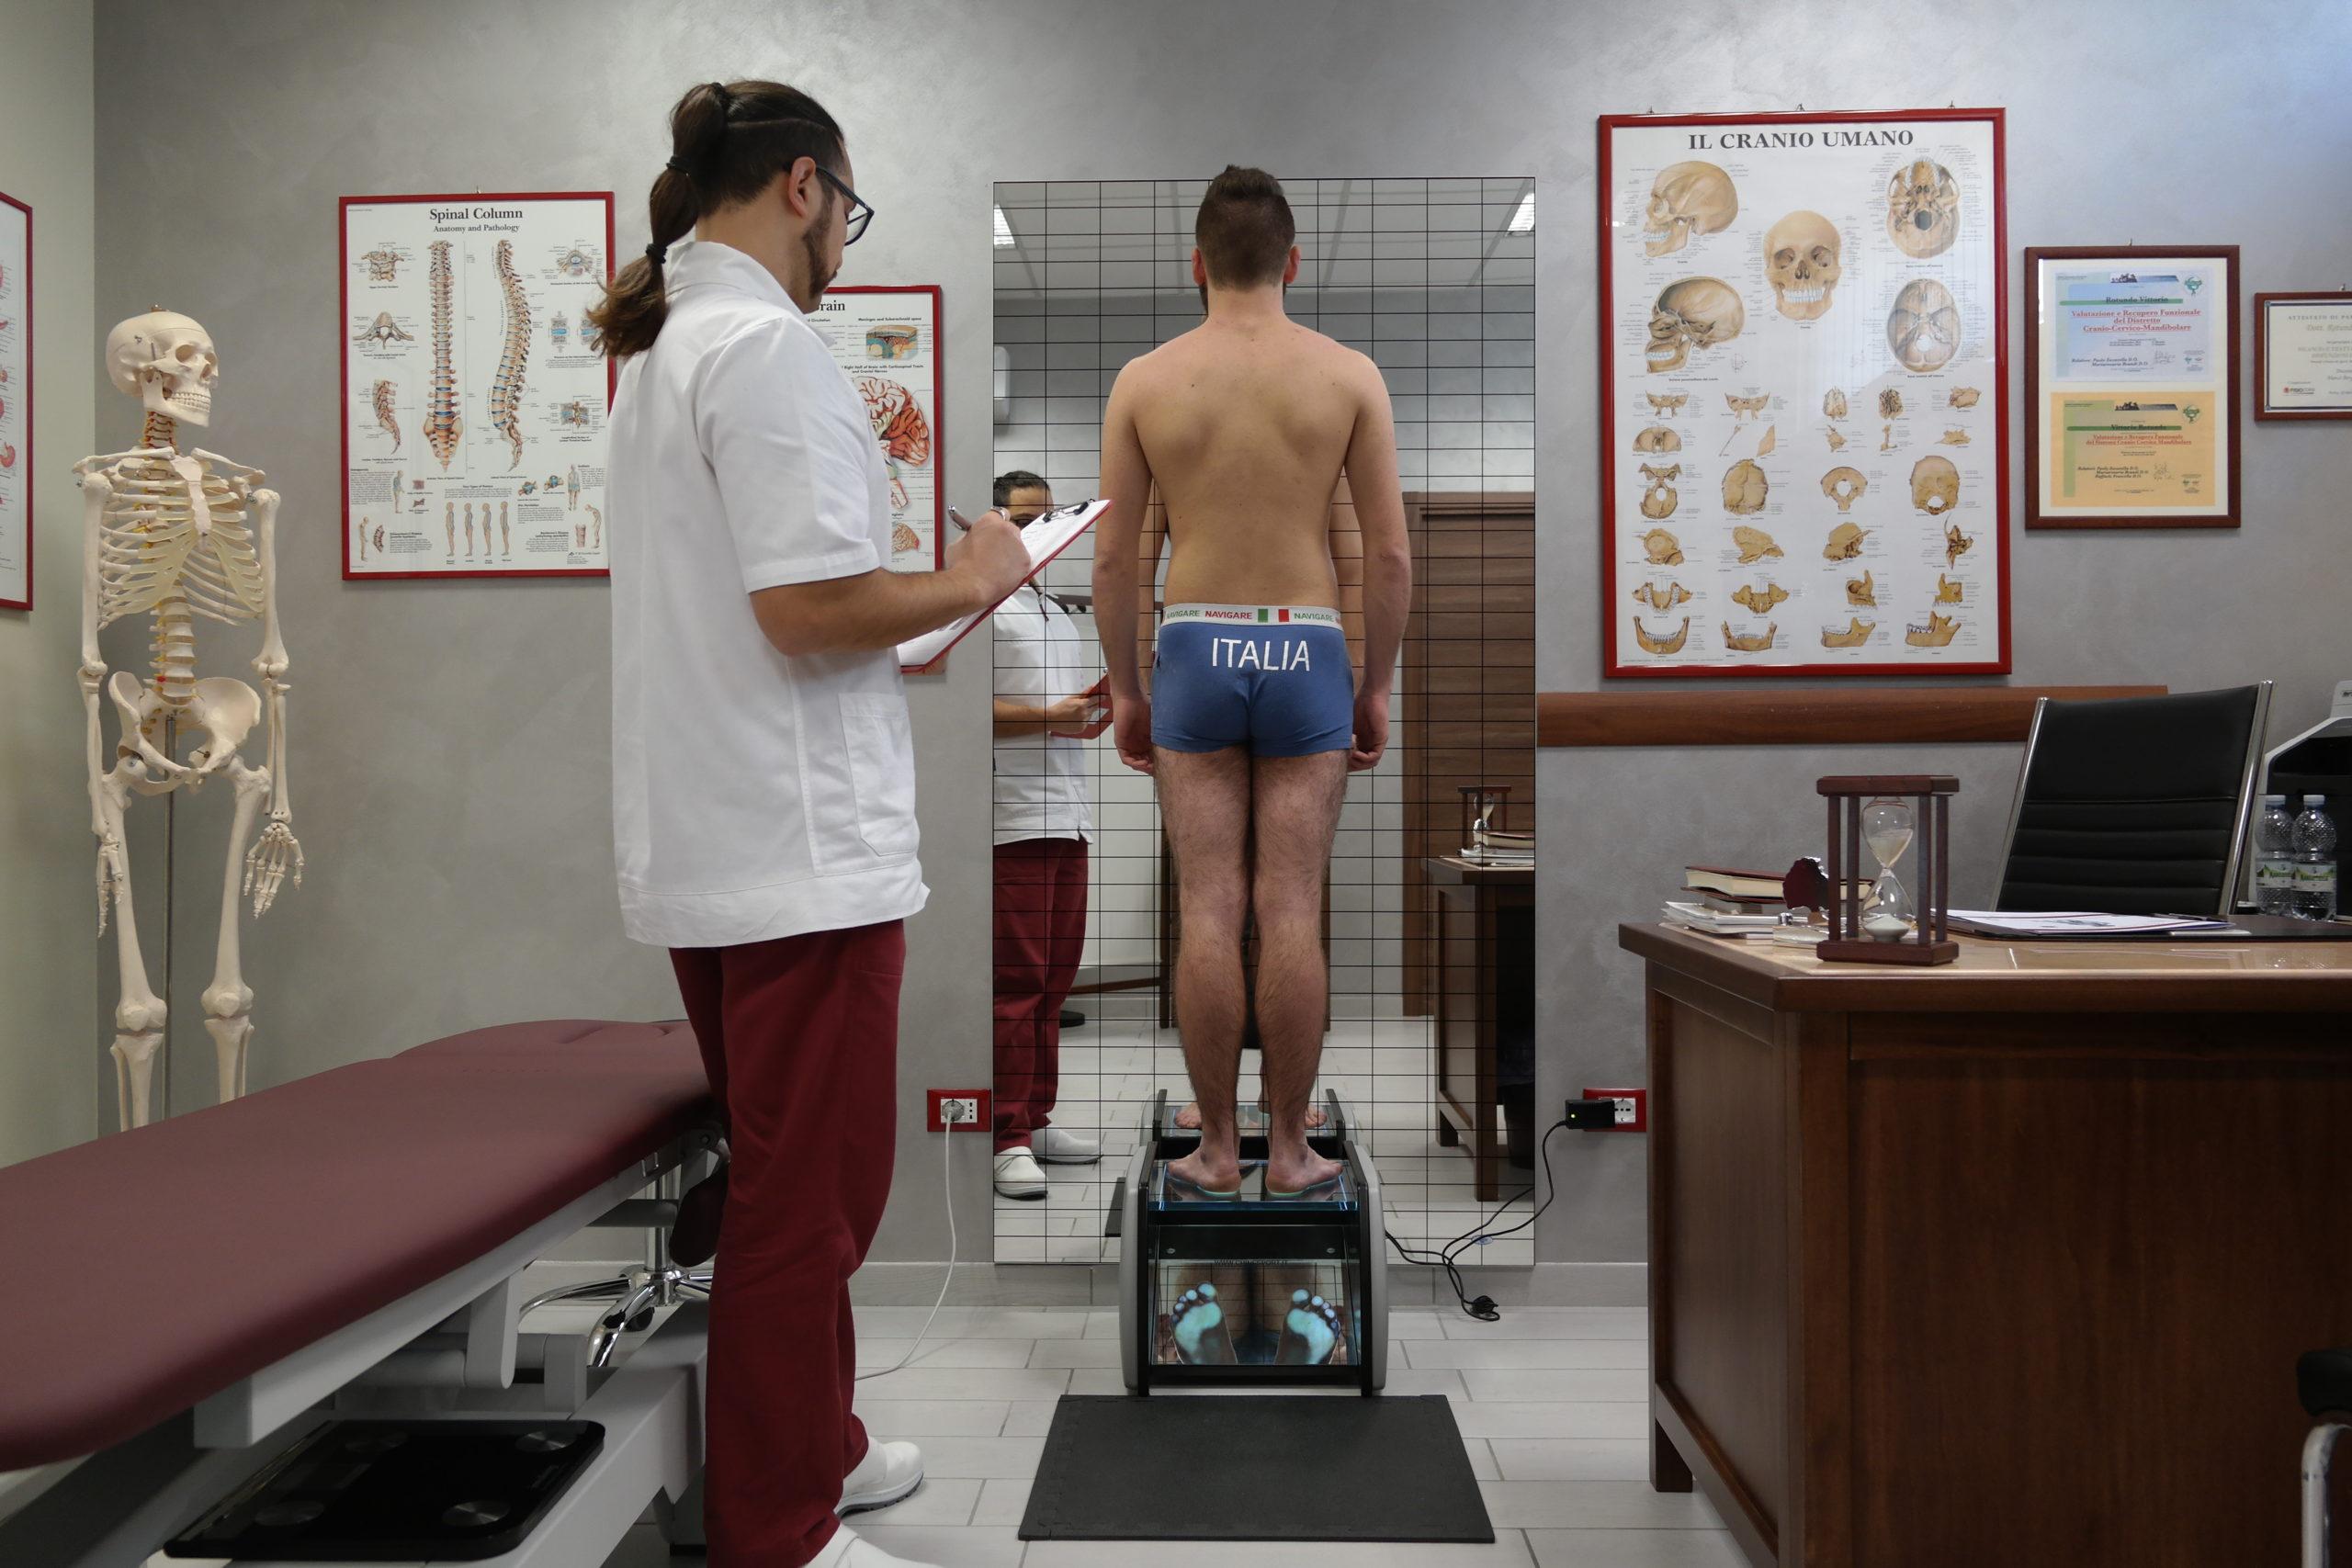 Analisi posturale: perché è importante